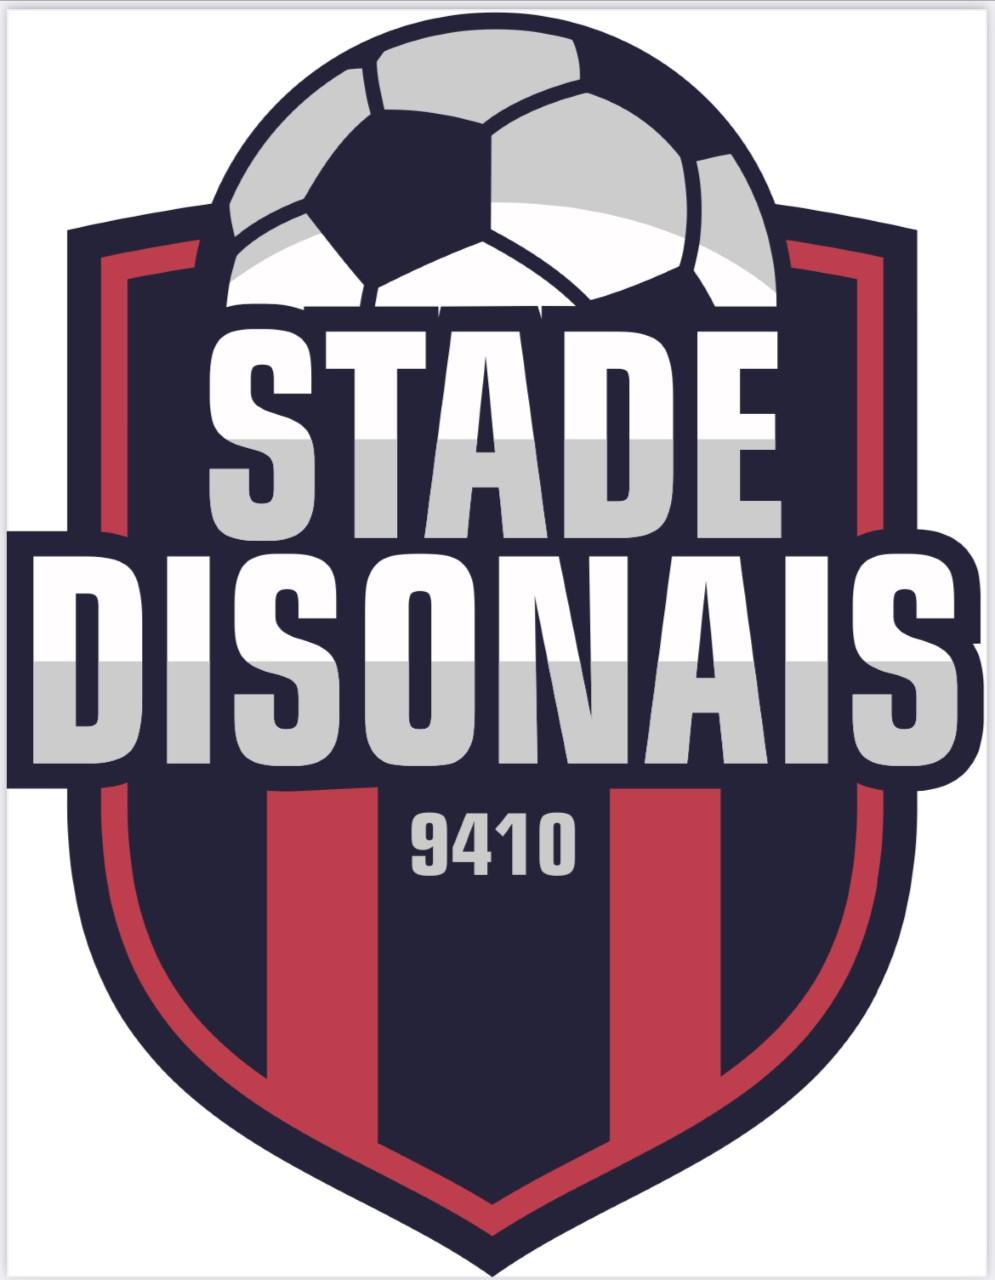 1 - Stade Disonais B